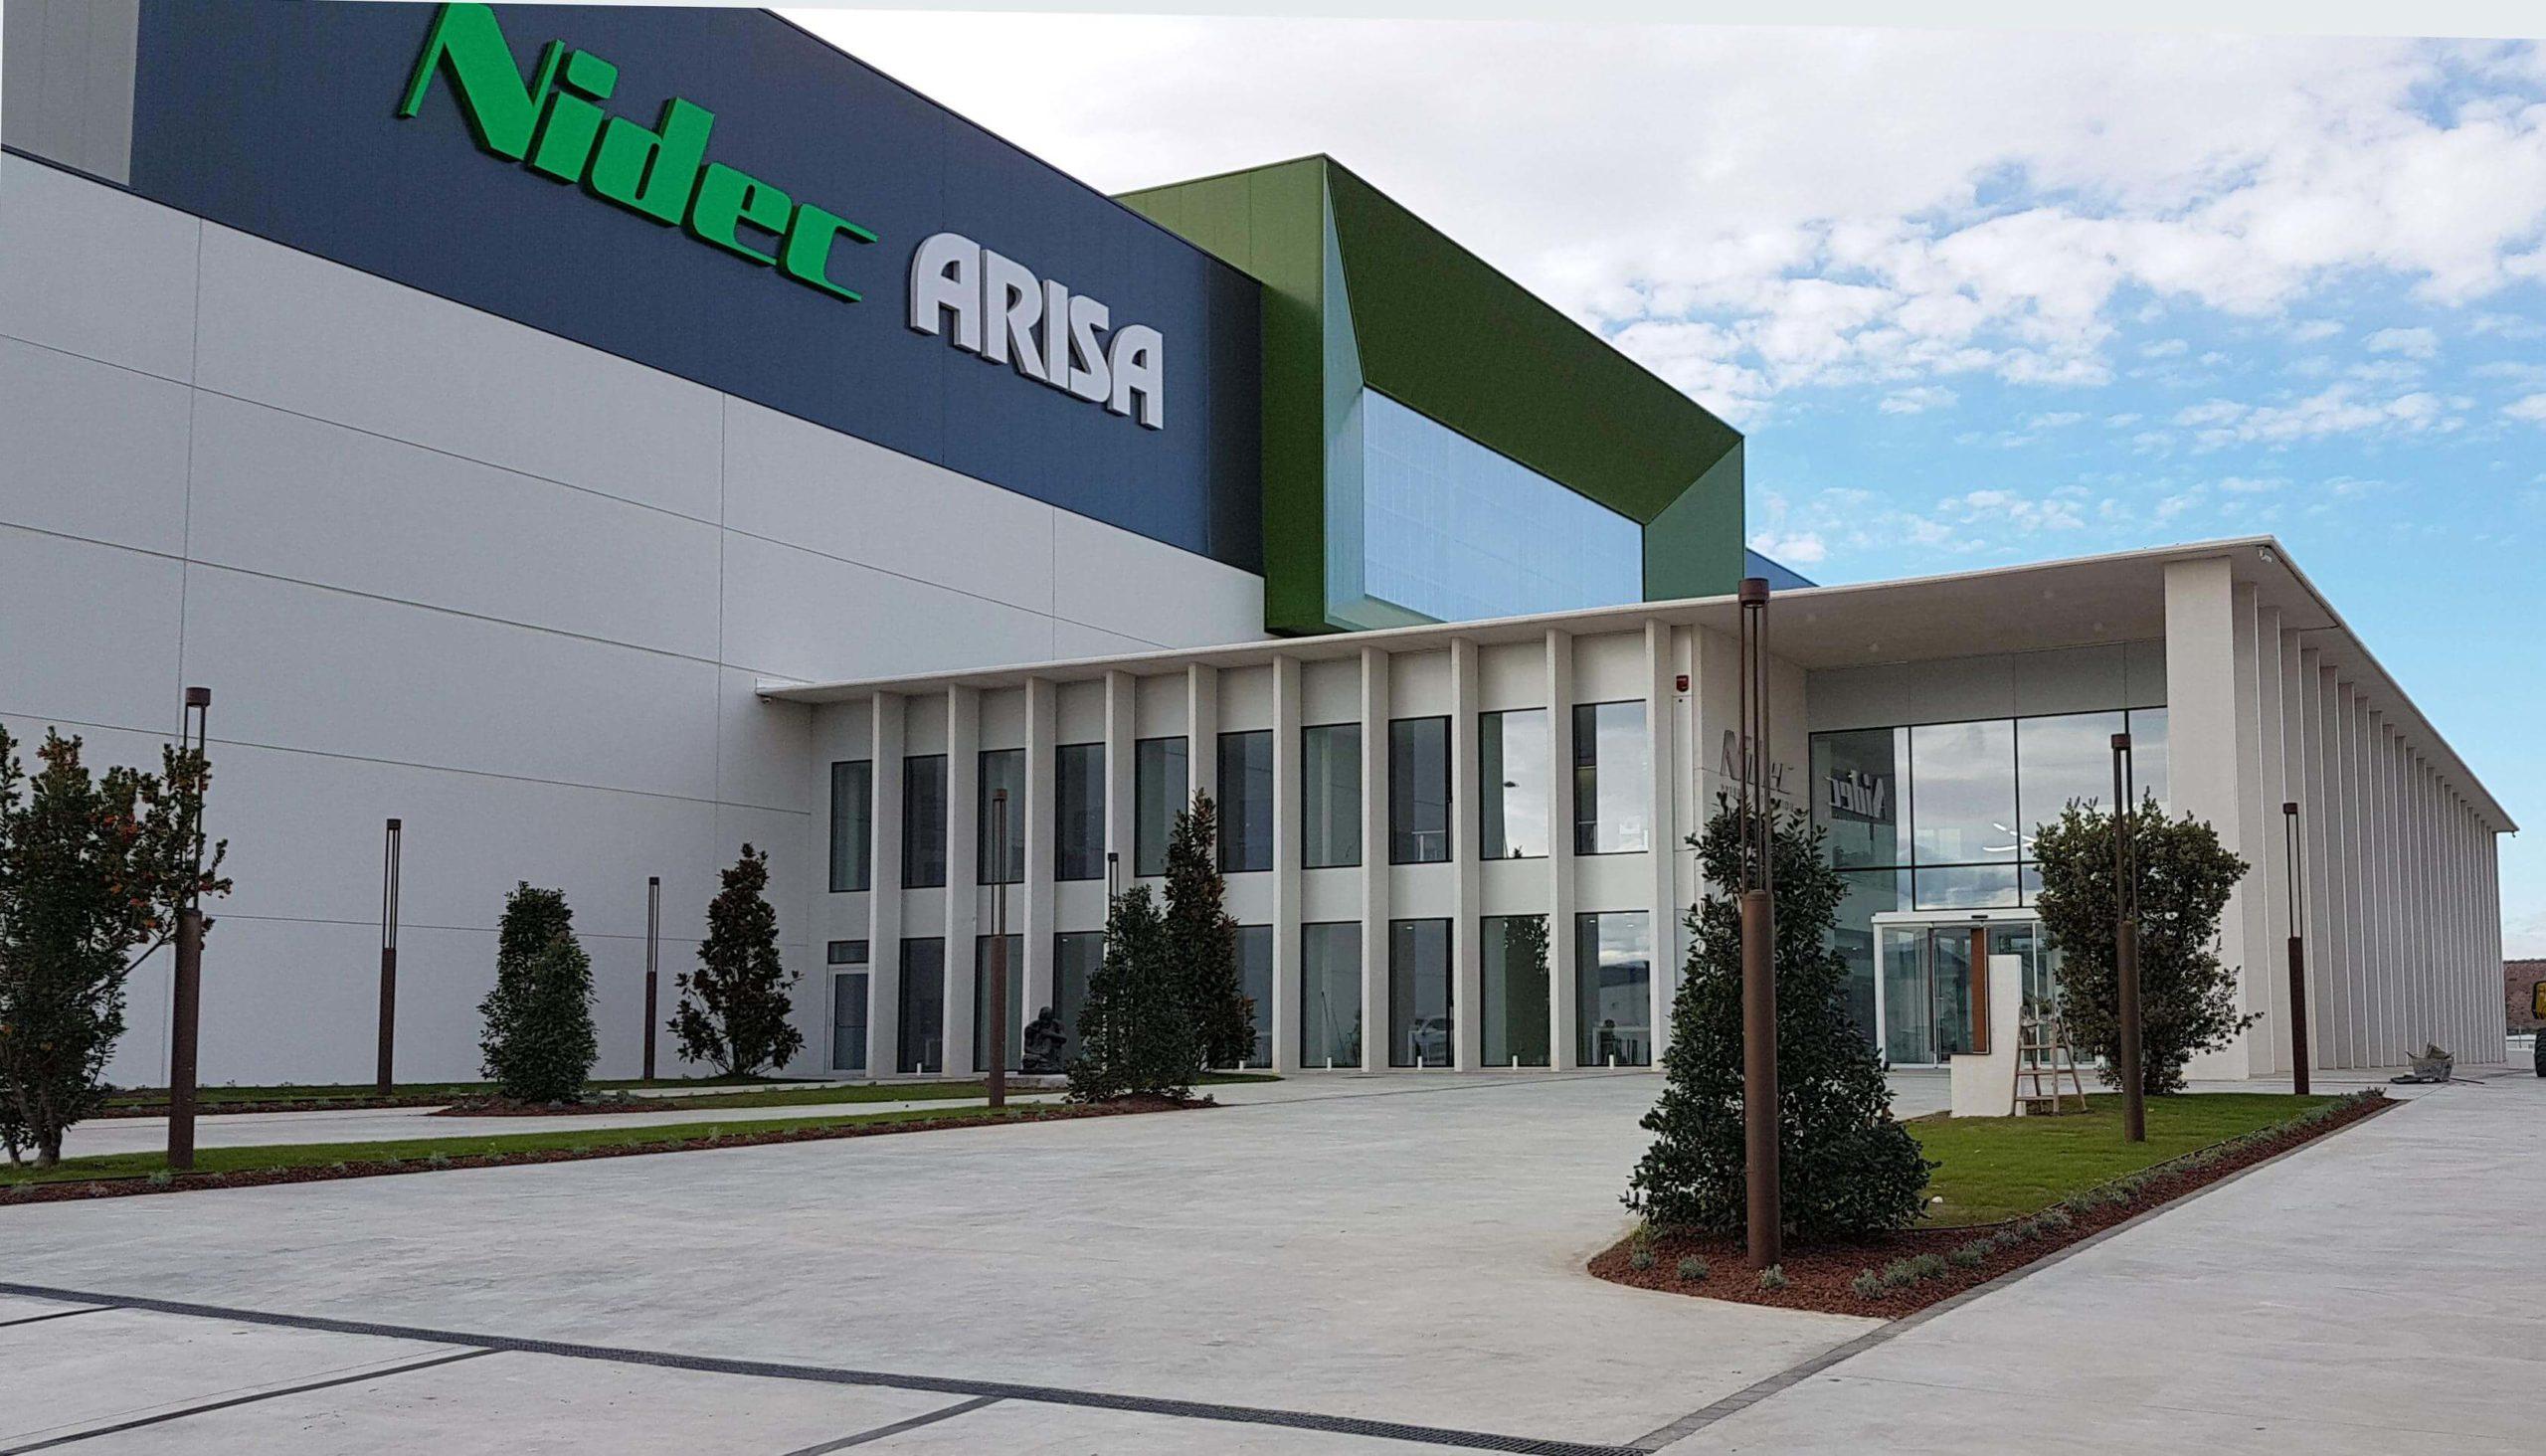 Instalaciones Nidec Arisa